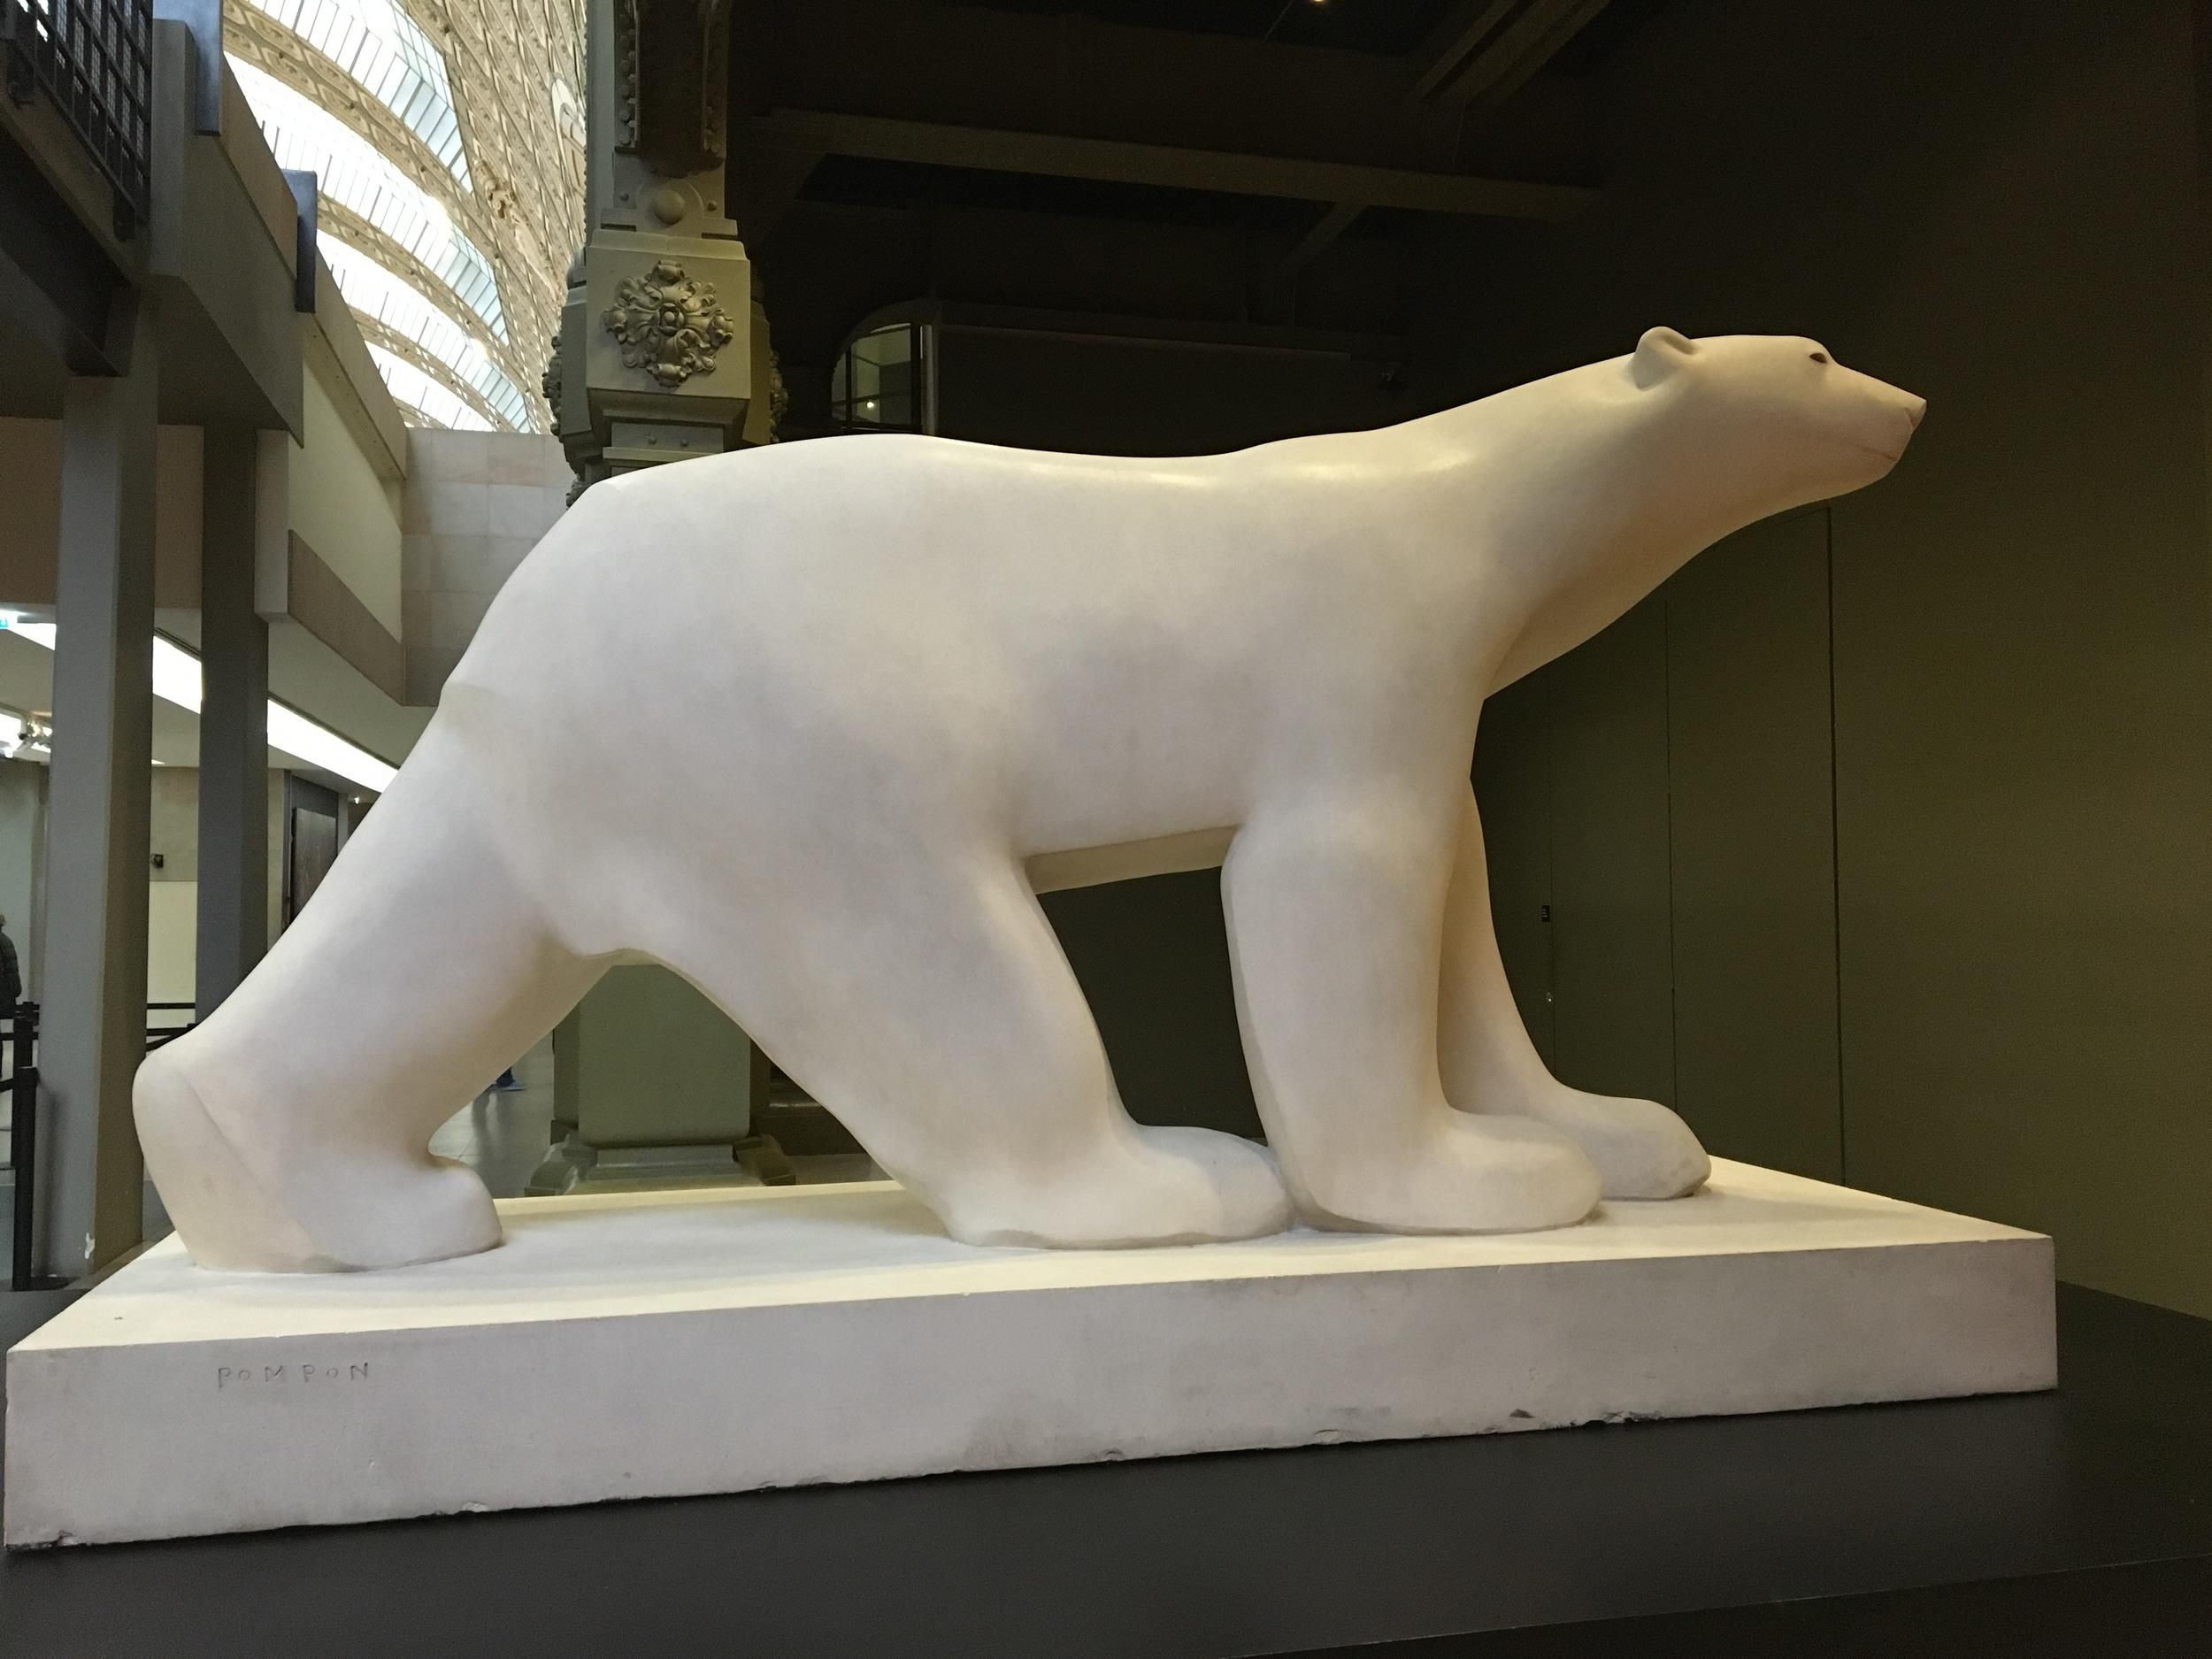 polar bear by Francoise Pompon